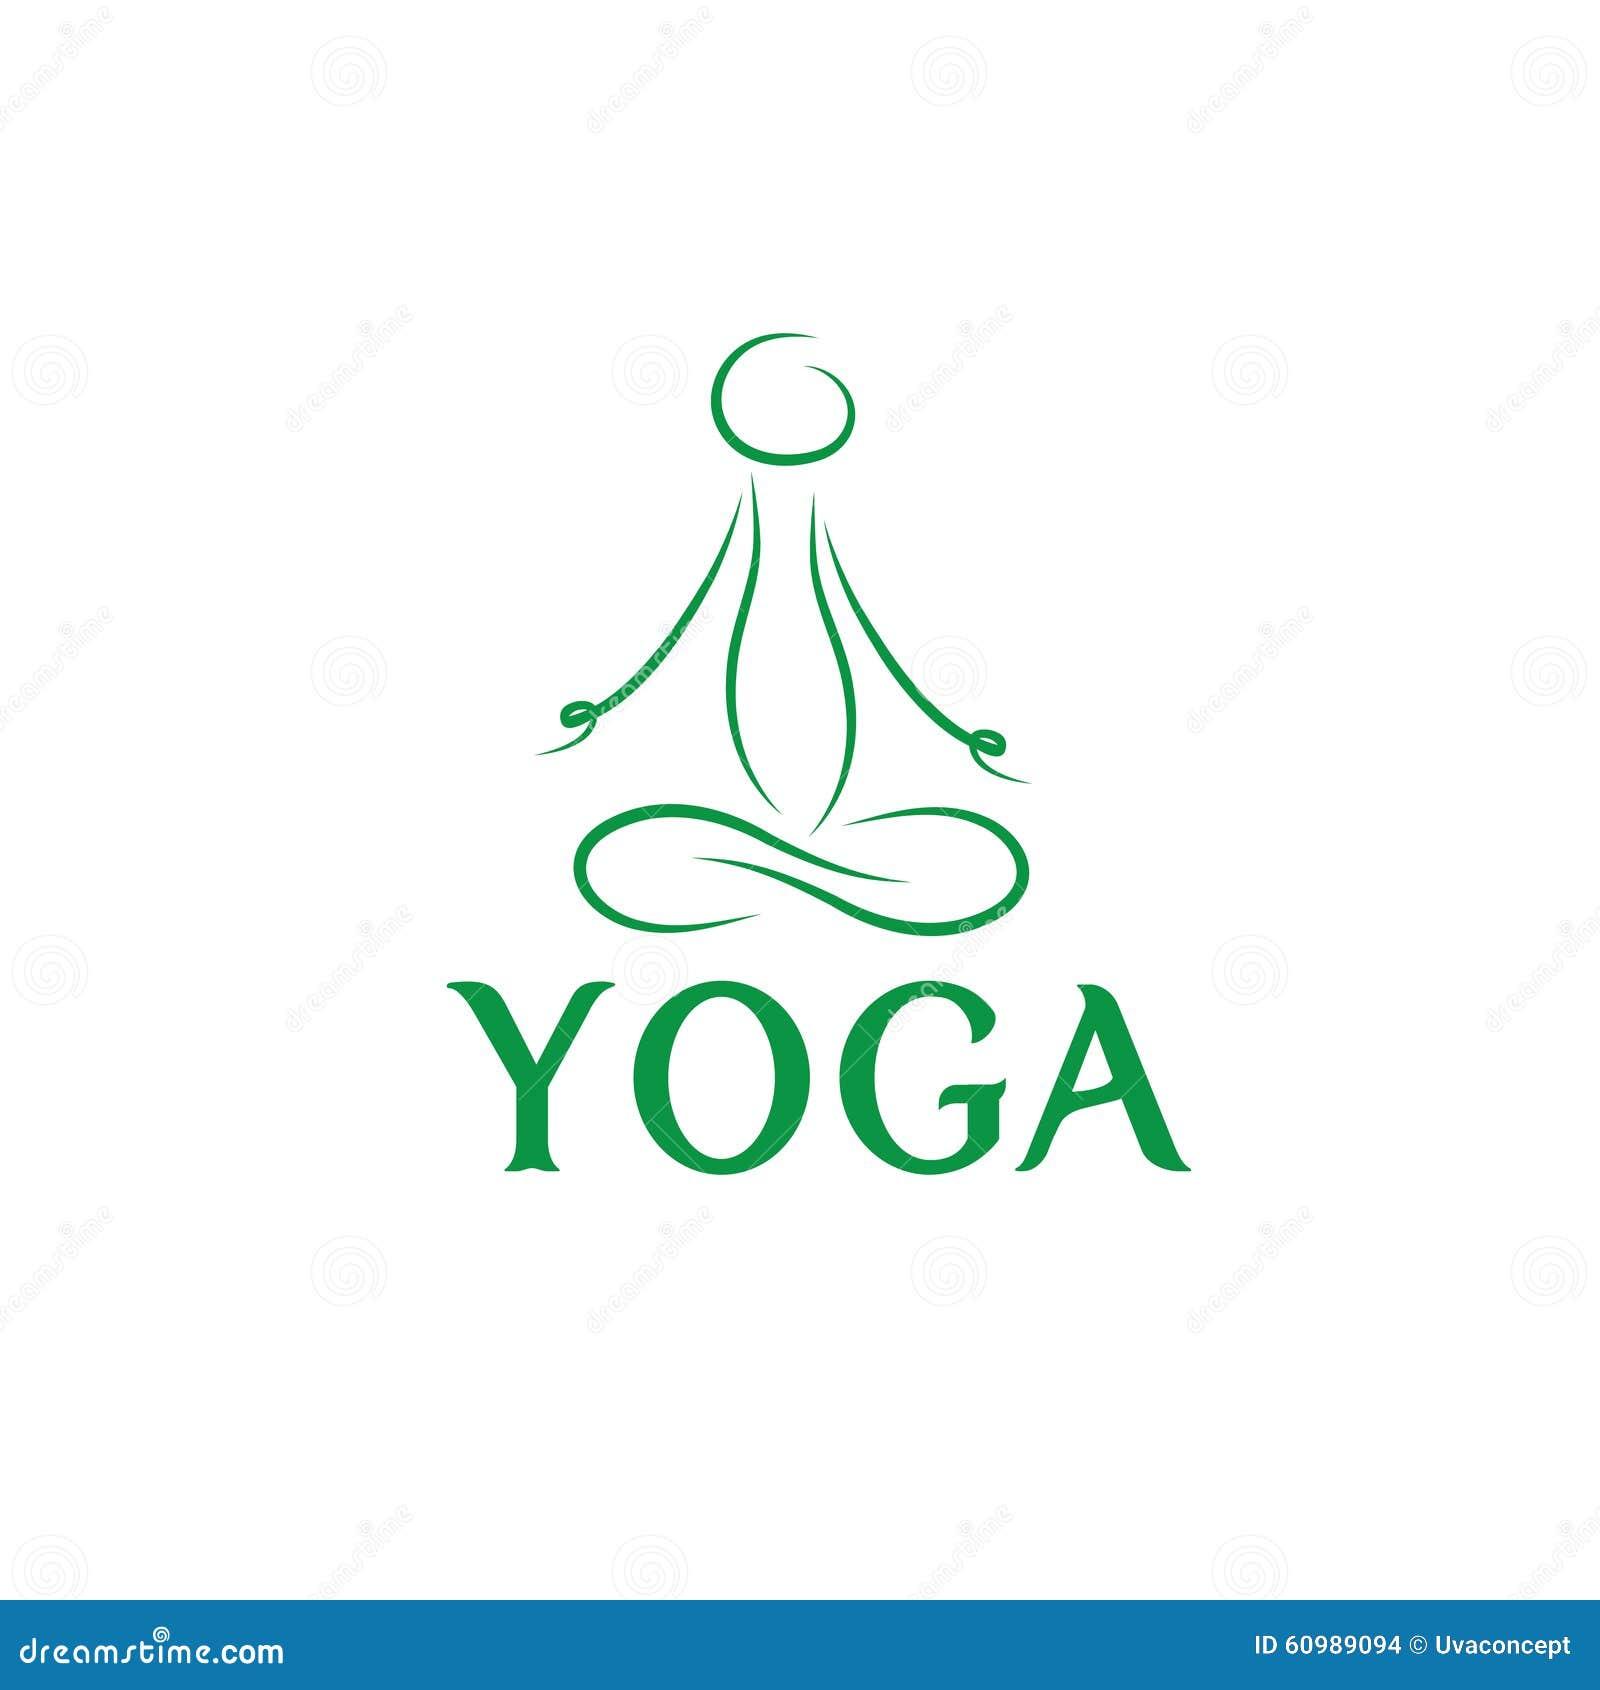 Line Art Yoga : Lotus pose art stock vector illustration of mindfulness